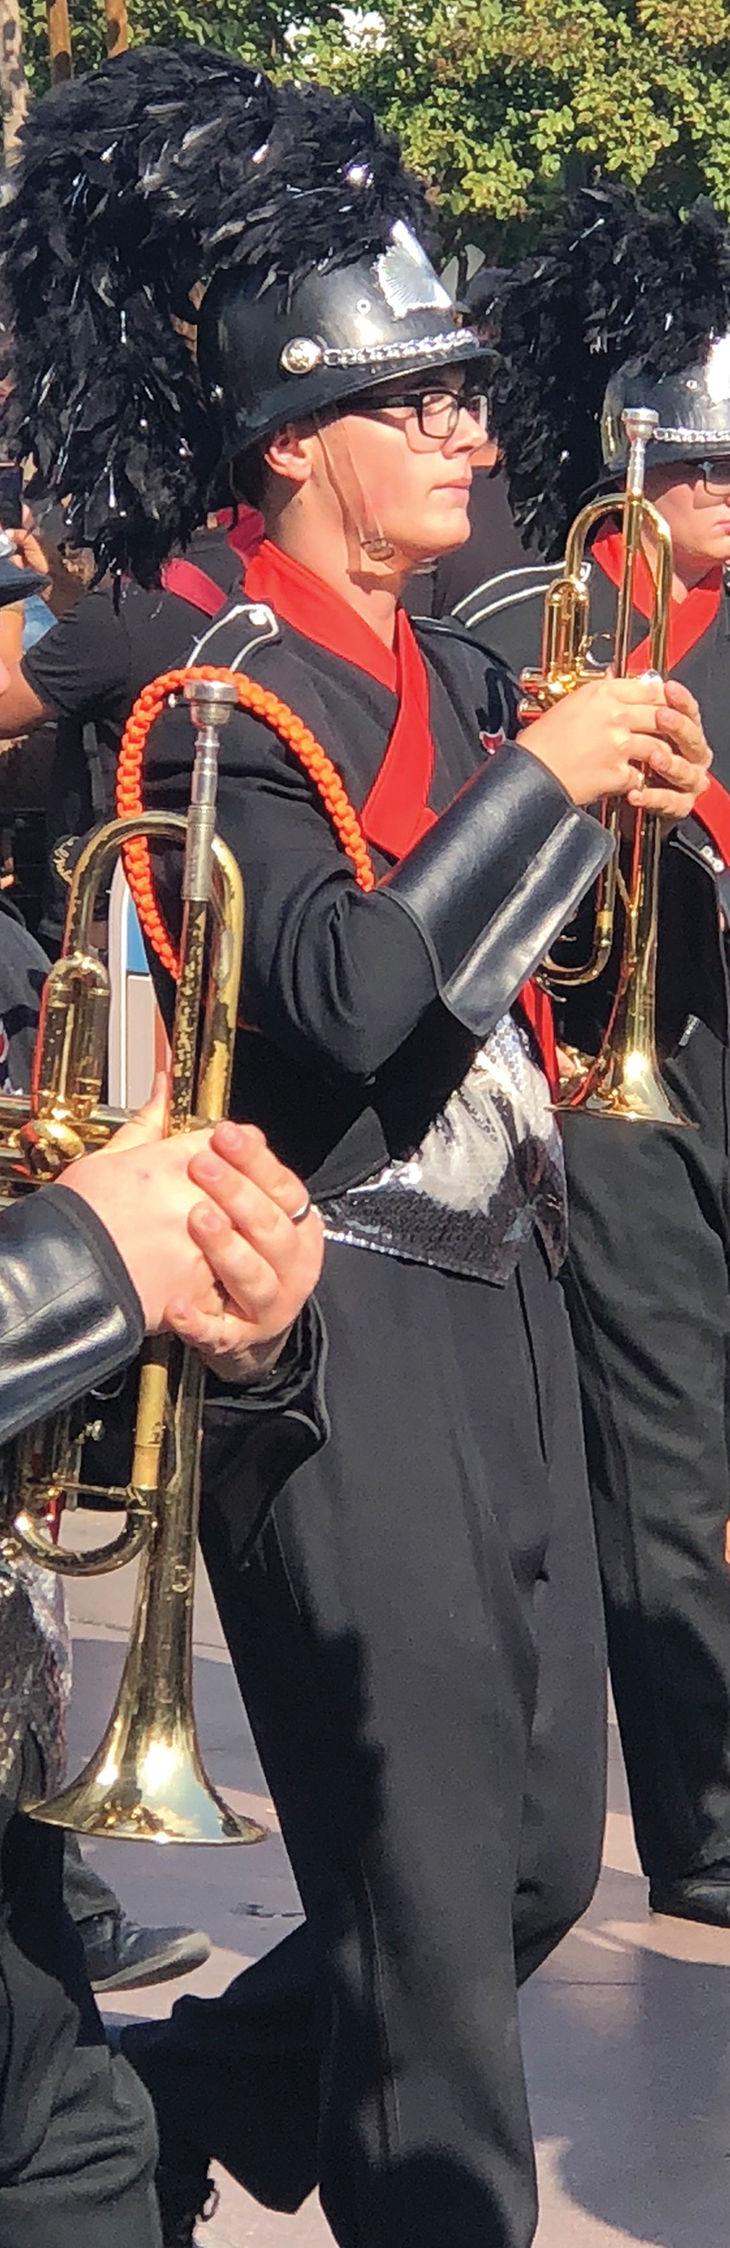 Fruitland Grizzlies trumpeter William McComb joins elite tour